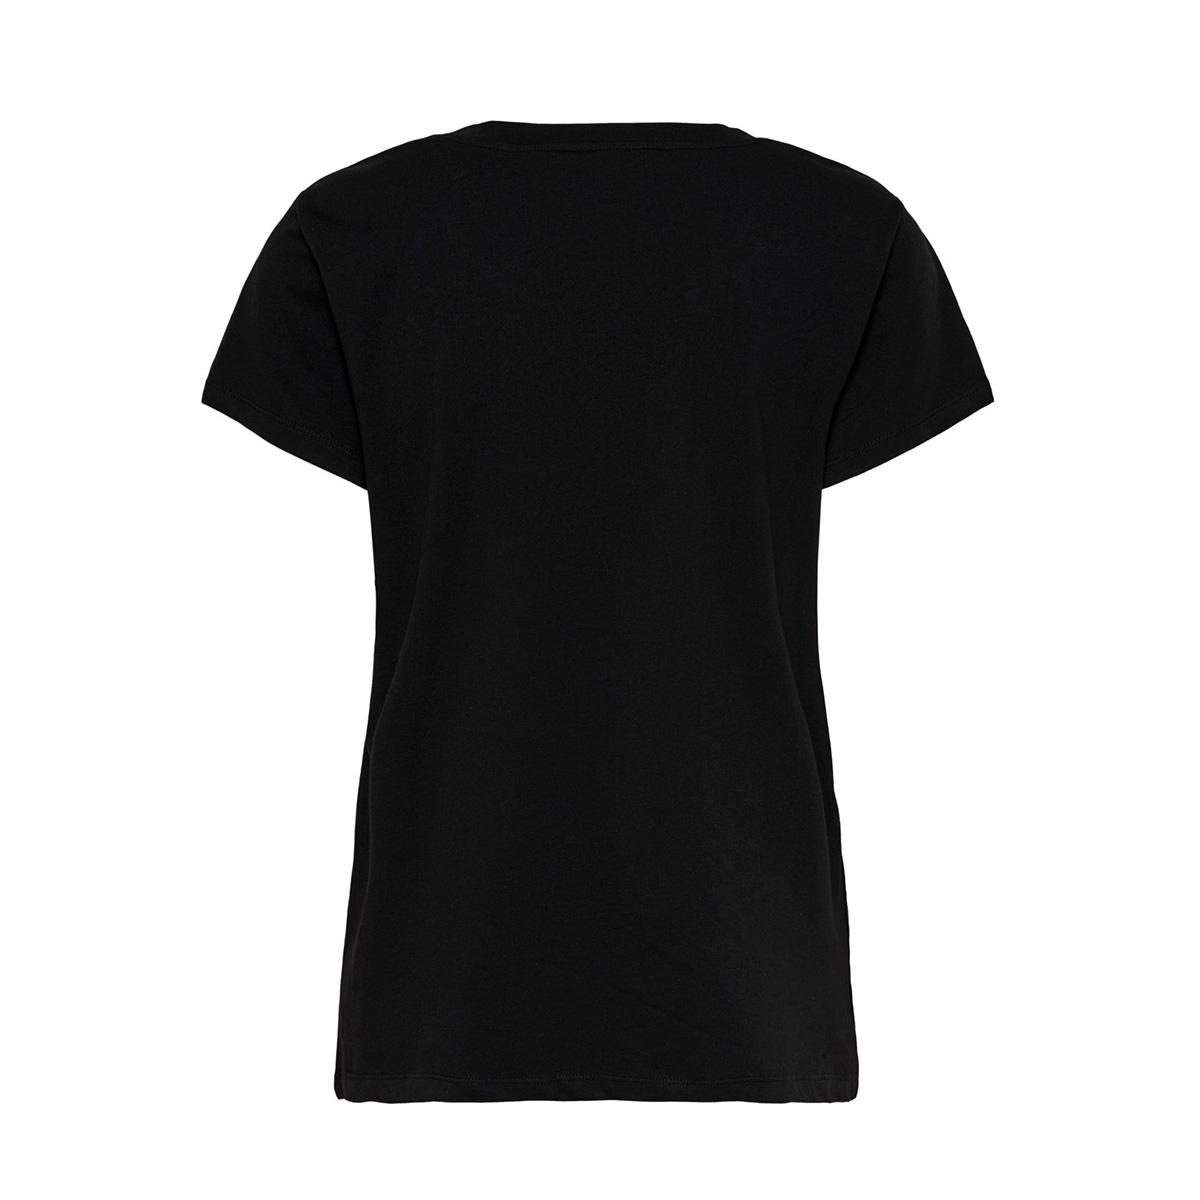 onlmarlyn s/s t-shirt jrs 15204633 only t-shirt black/paris